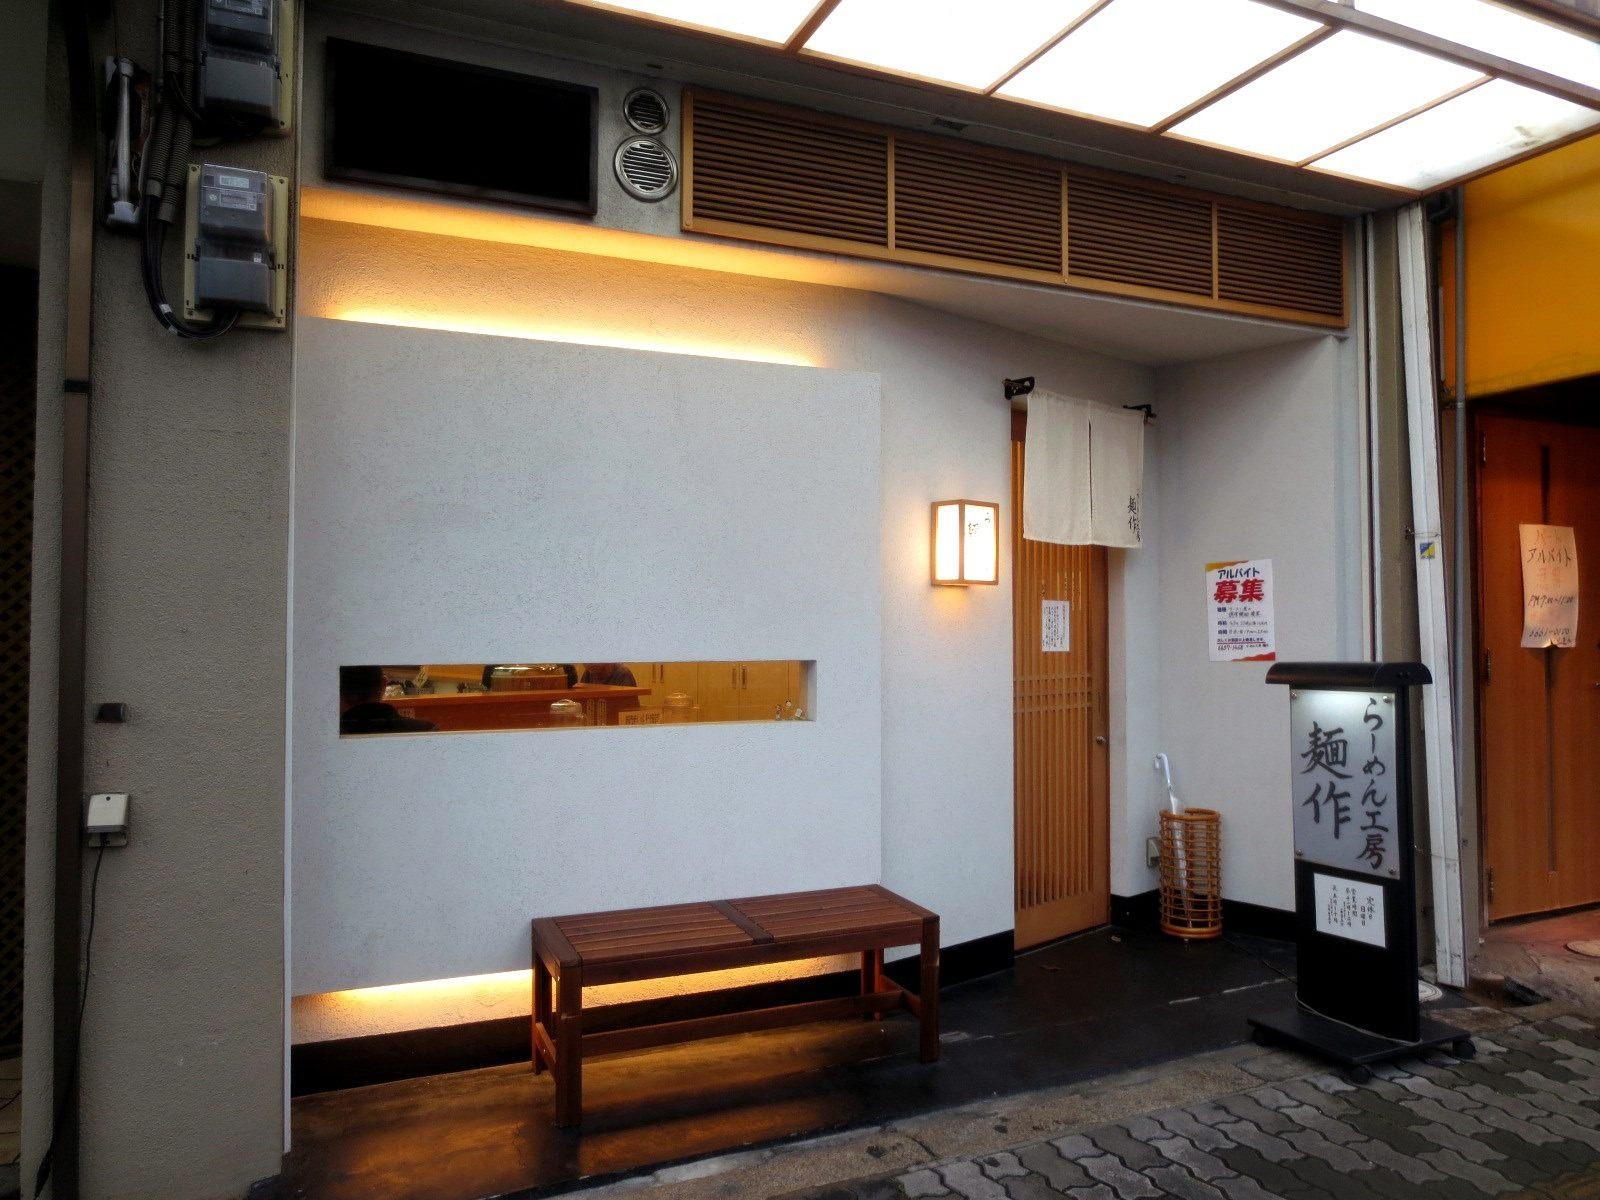 Ramen Kobo Mensaku's exterior